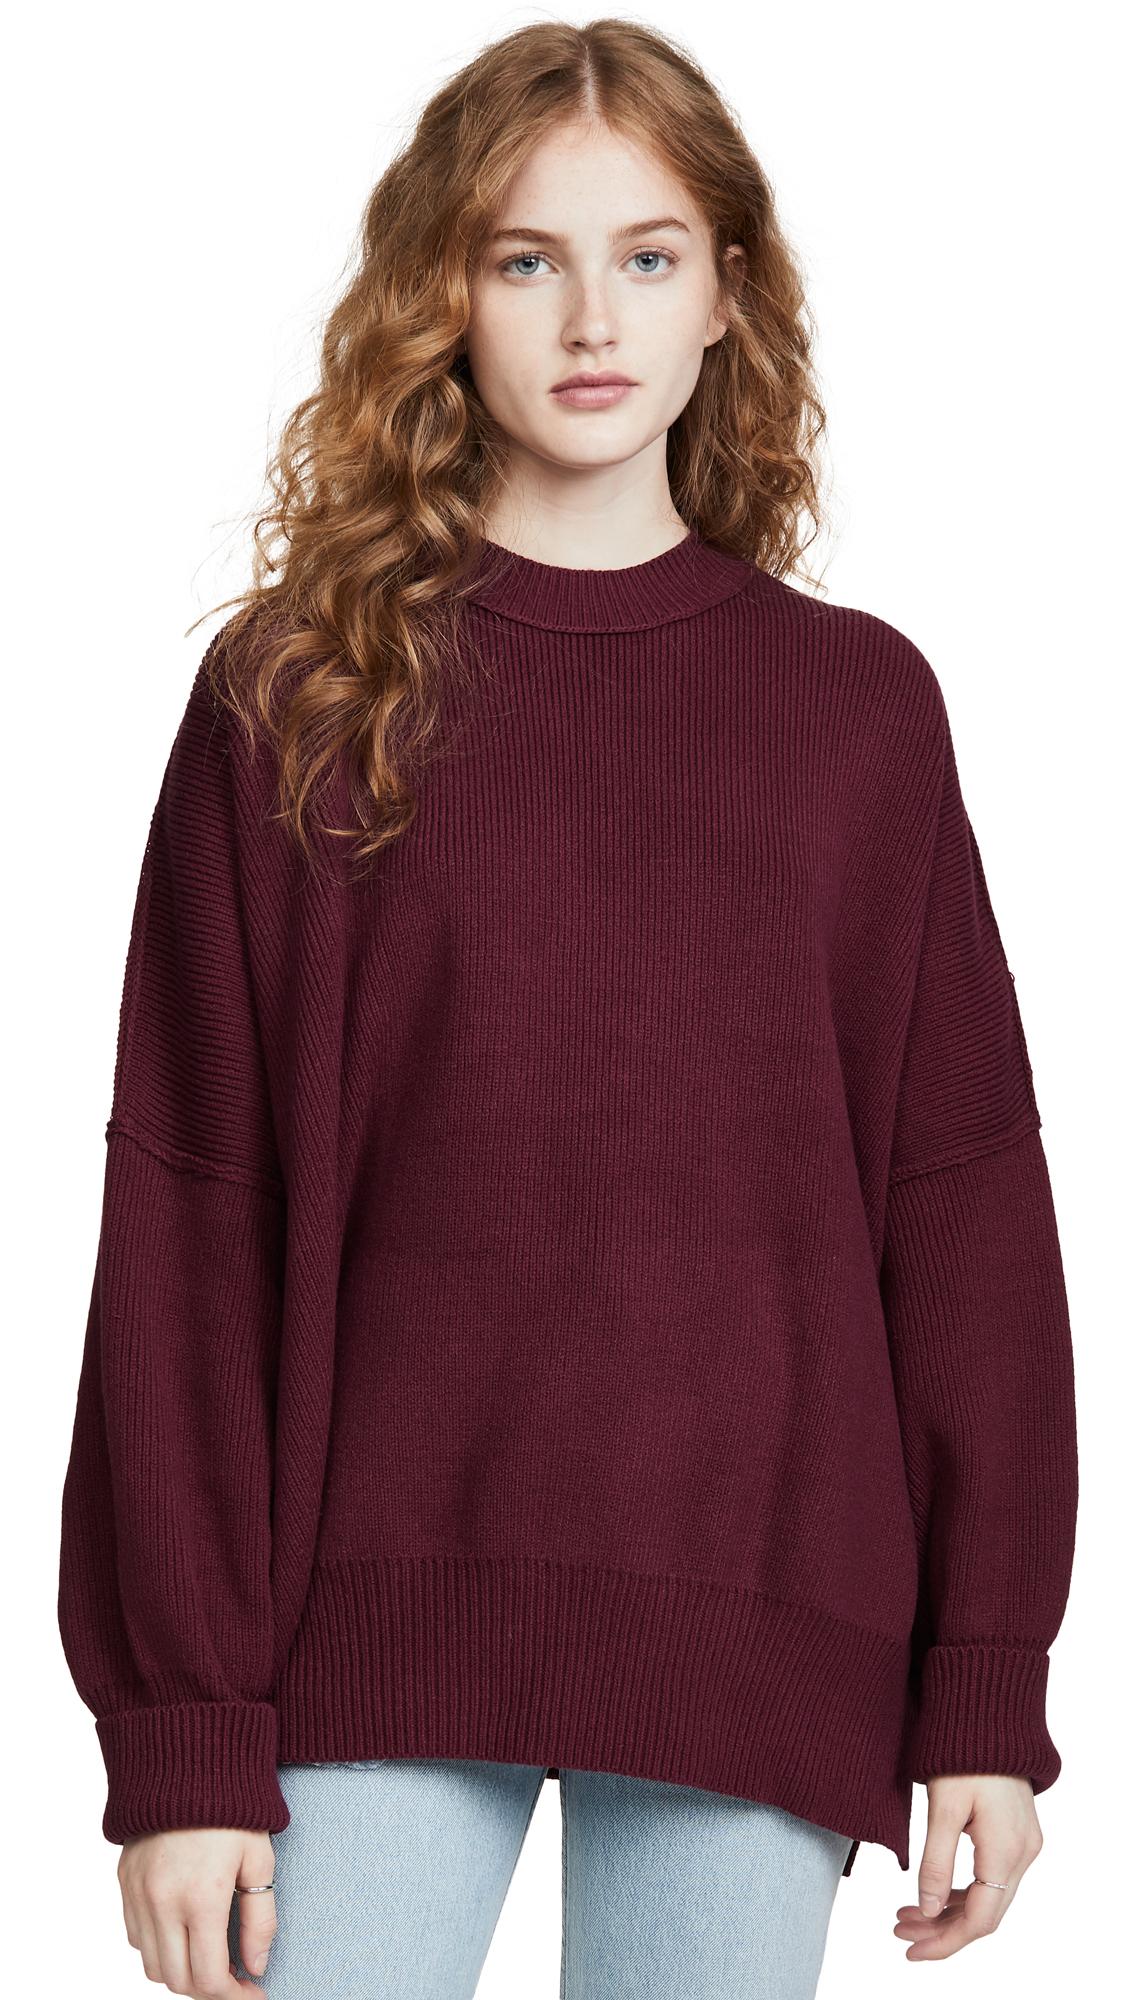 Free People Sweaters EASY STREET TUNIC SWEATER